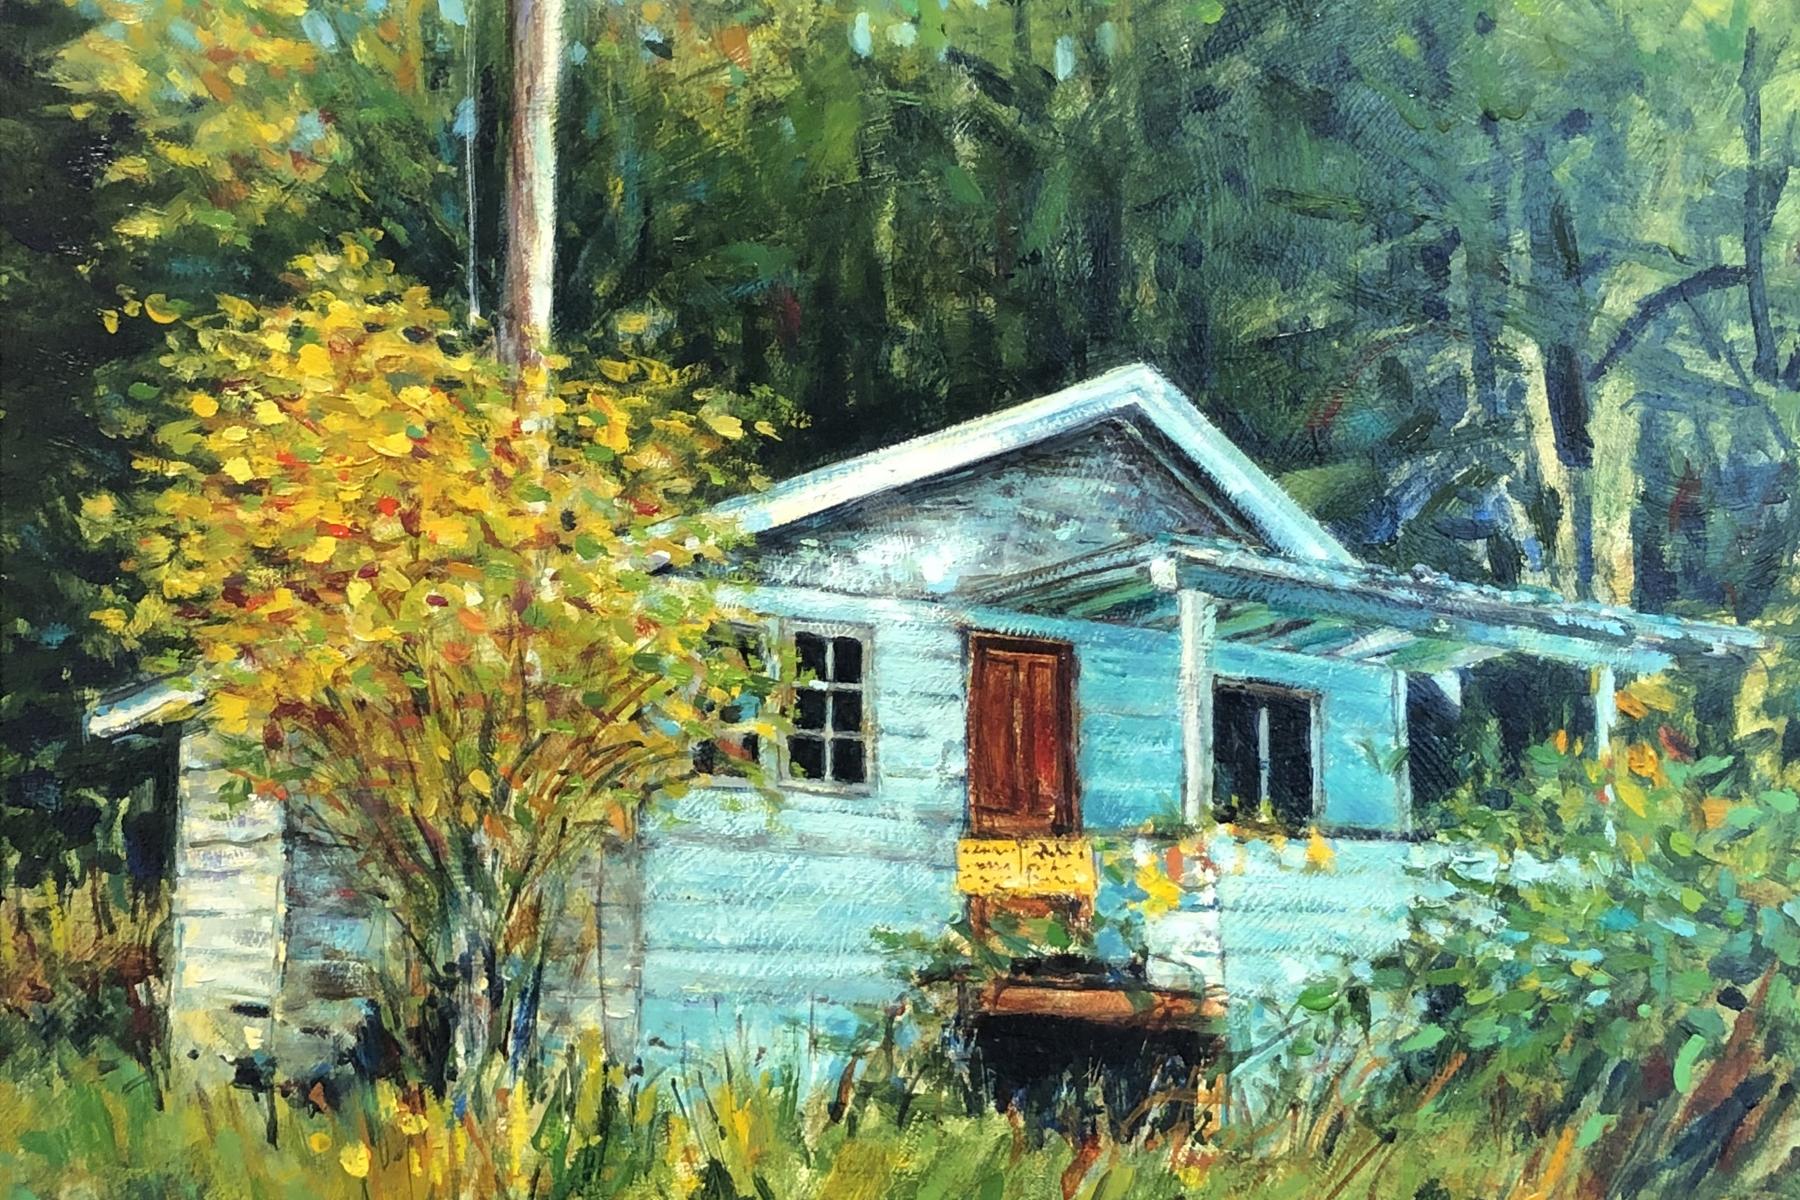 Landscape Painting | Pender Island | Artist Painter Kim Pollard | Canada | Roesland